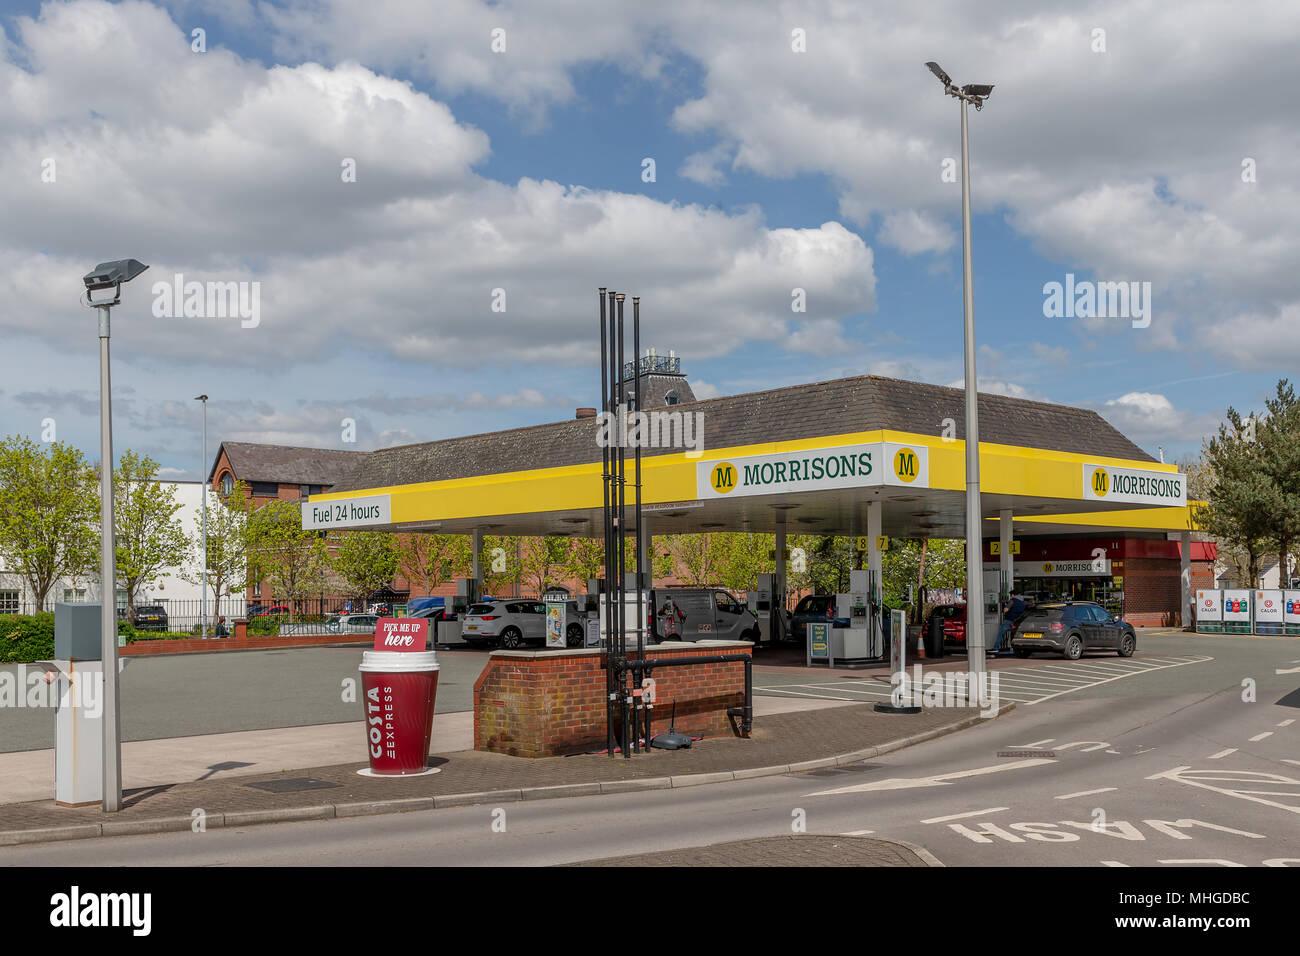 Morrisons supermarket in Stockton Heath, near Warrington, Cheshire, England, UK on 30 April 2018 - Stock Image